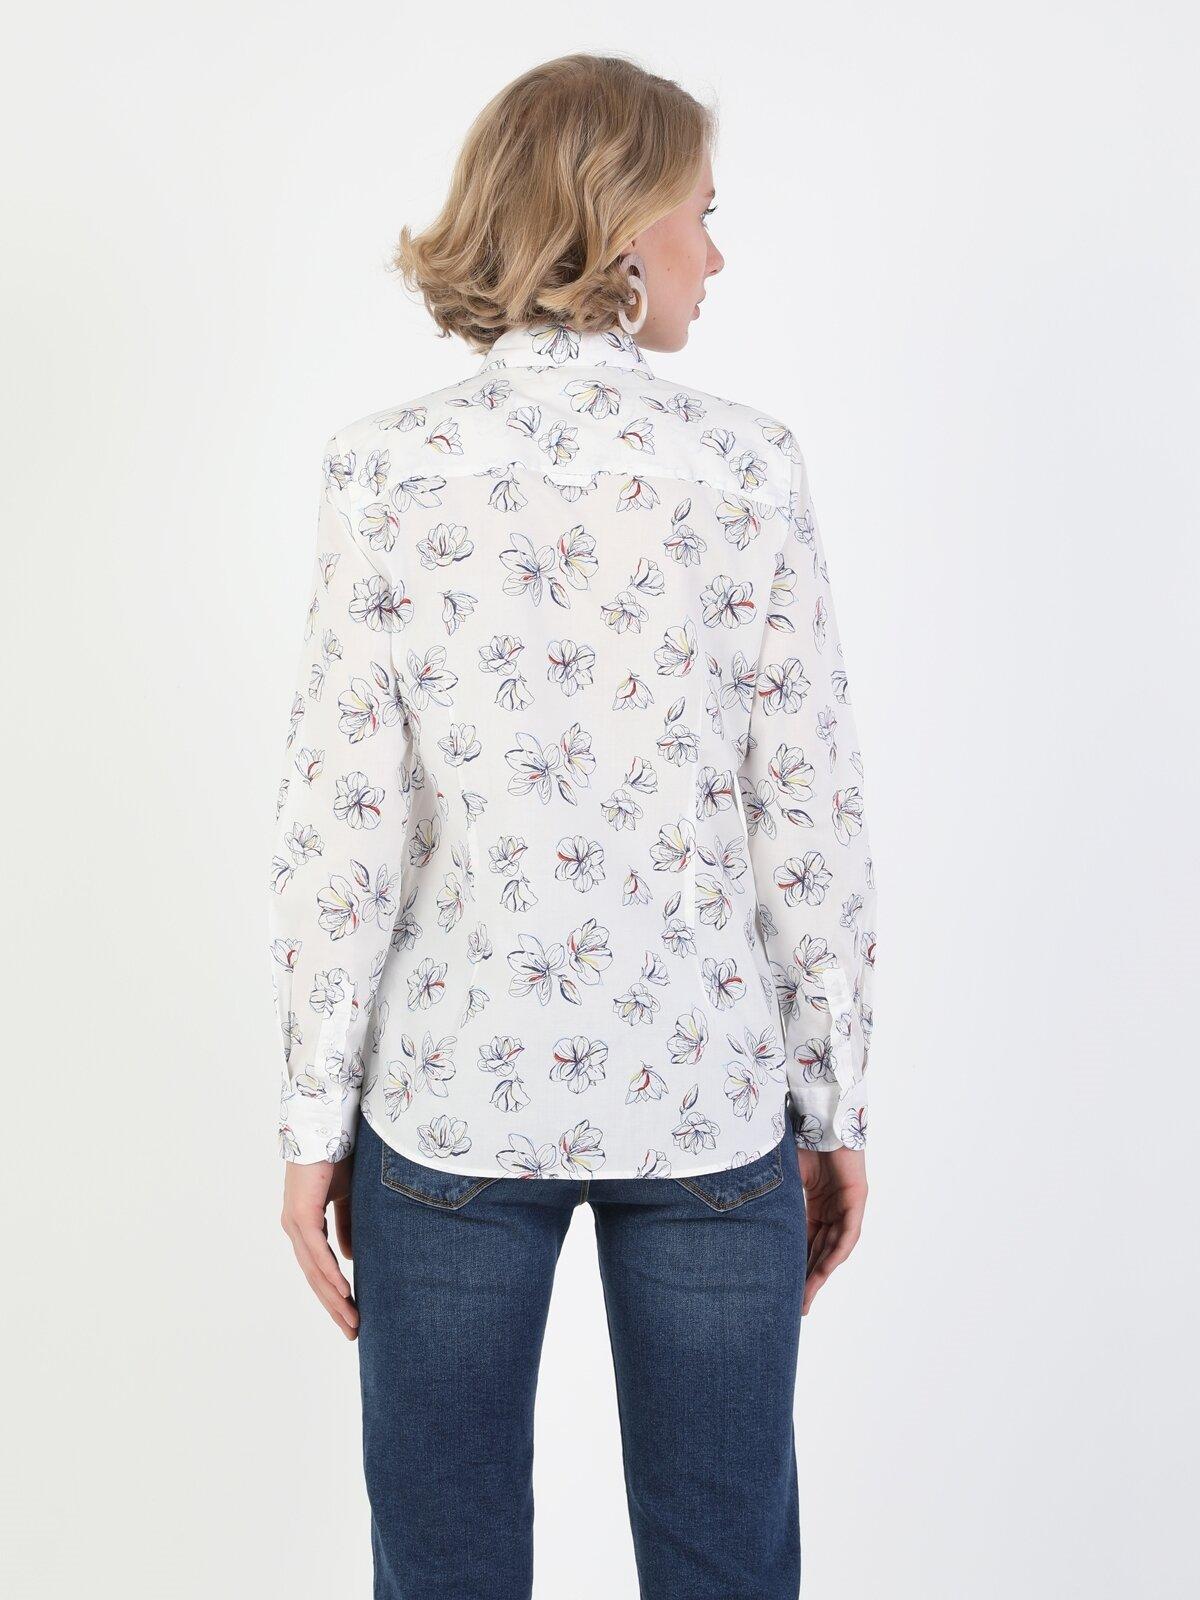 Süper Slim Fit-Stretch Shirt Neck Kadın Beyaz Uzun Kol Gömlek